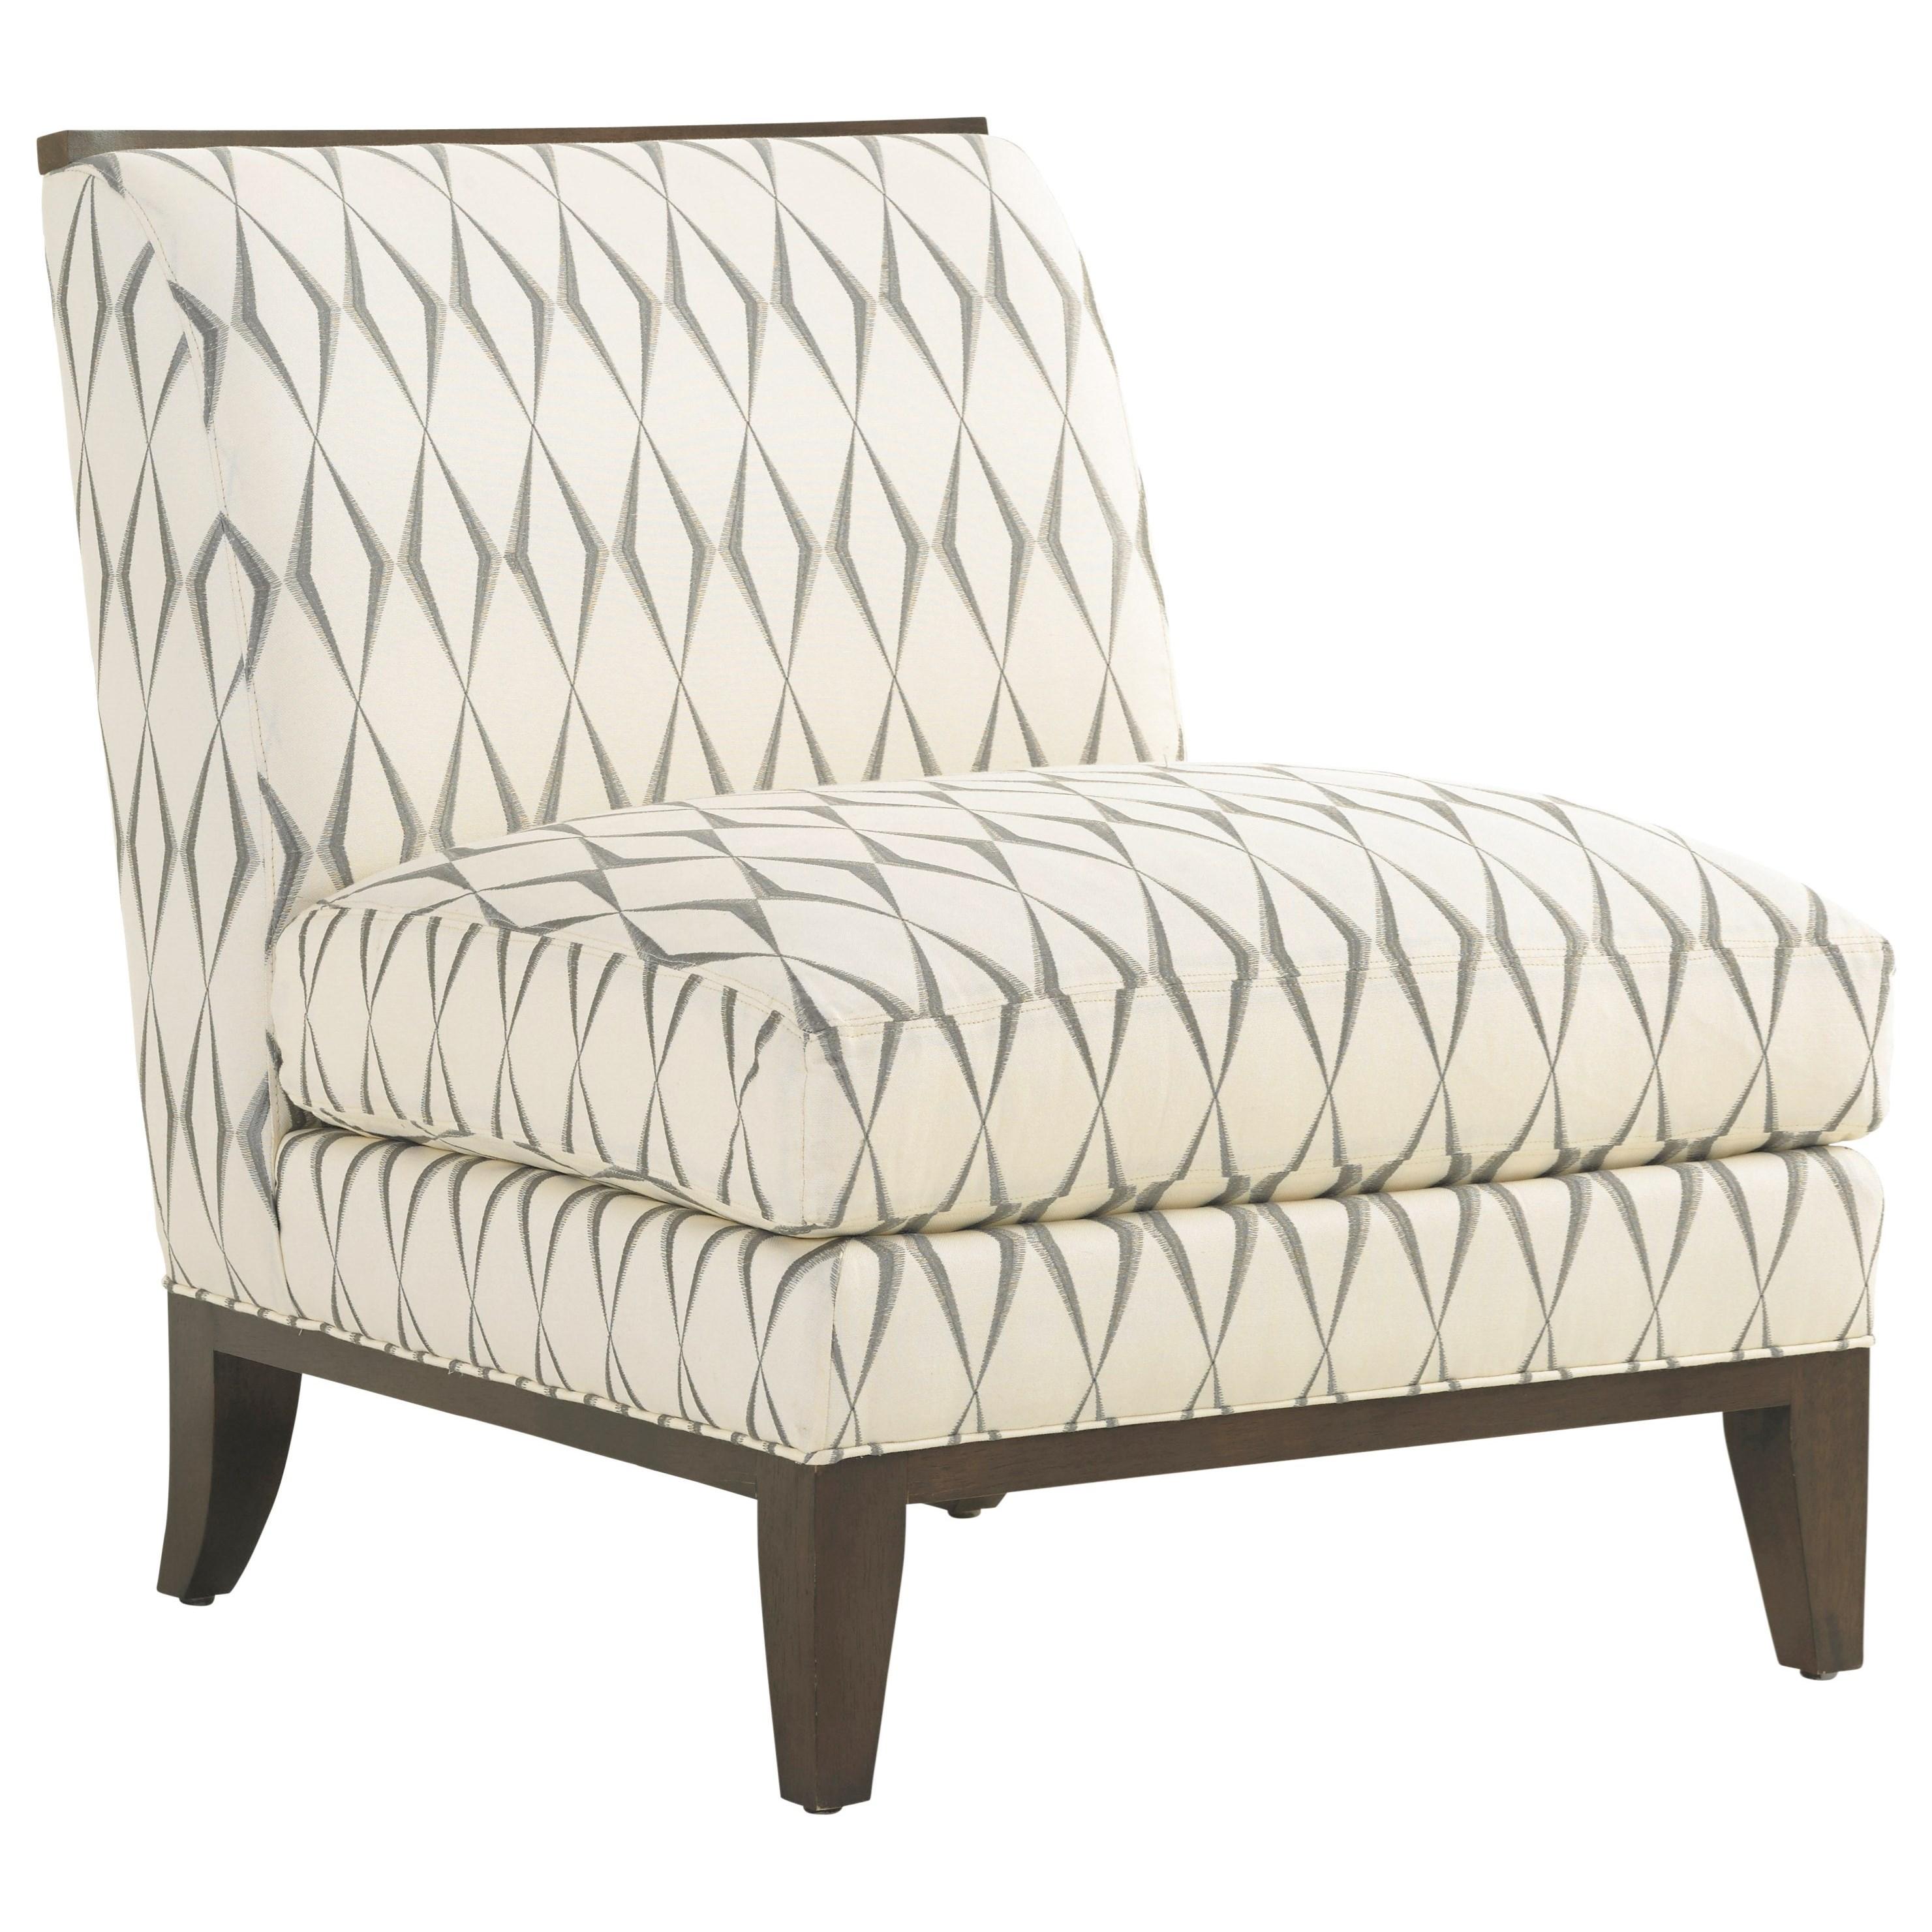 MacArthur Park Branford Armless Chair by Lexington at Baer's Furniture